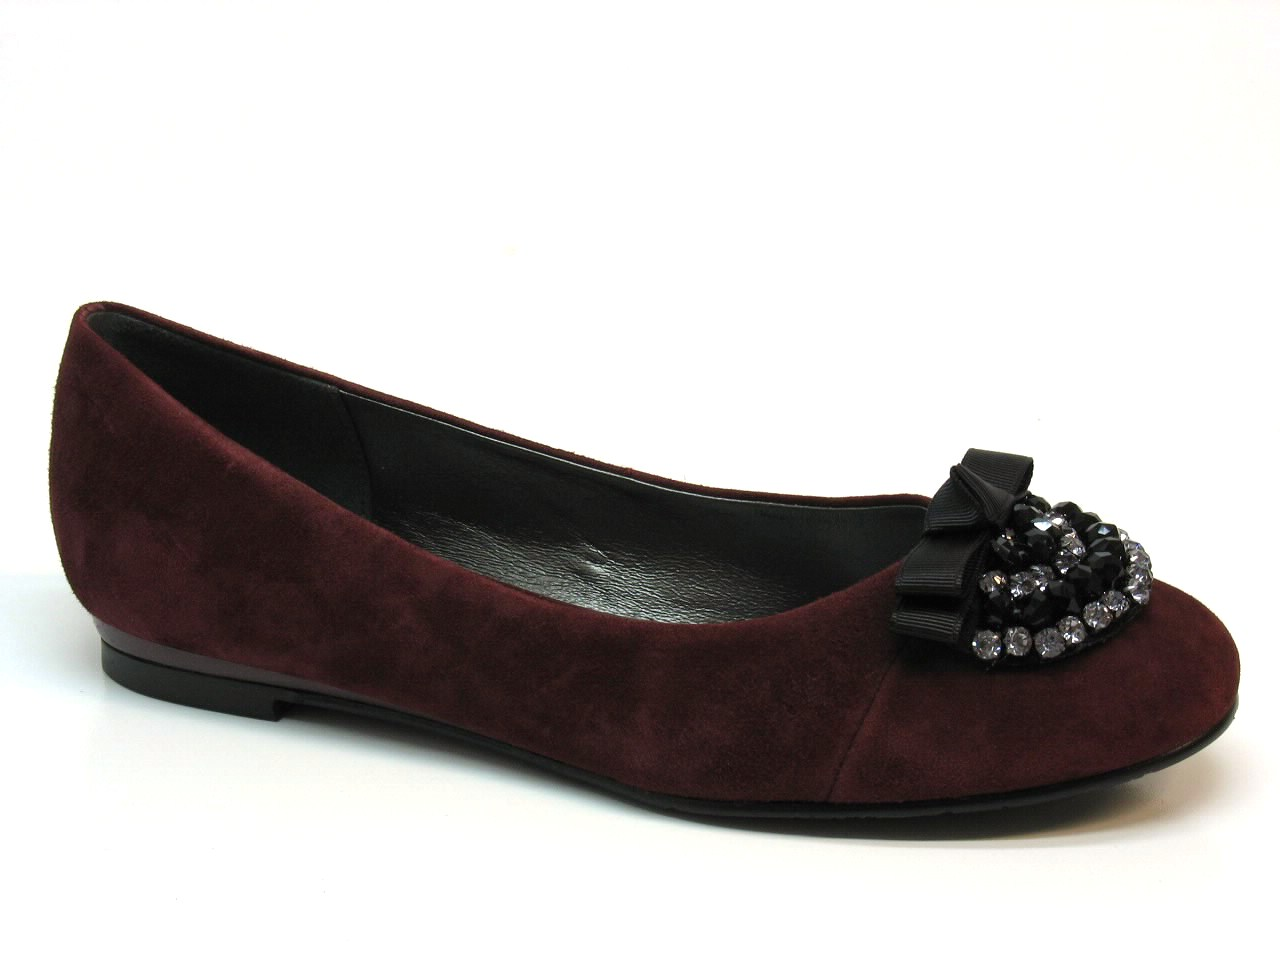 Sapatos Baixos, Sabrinas, Mocassins Roberto Botella - 387M11901